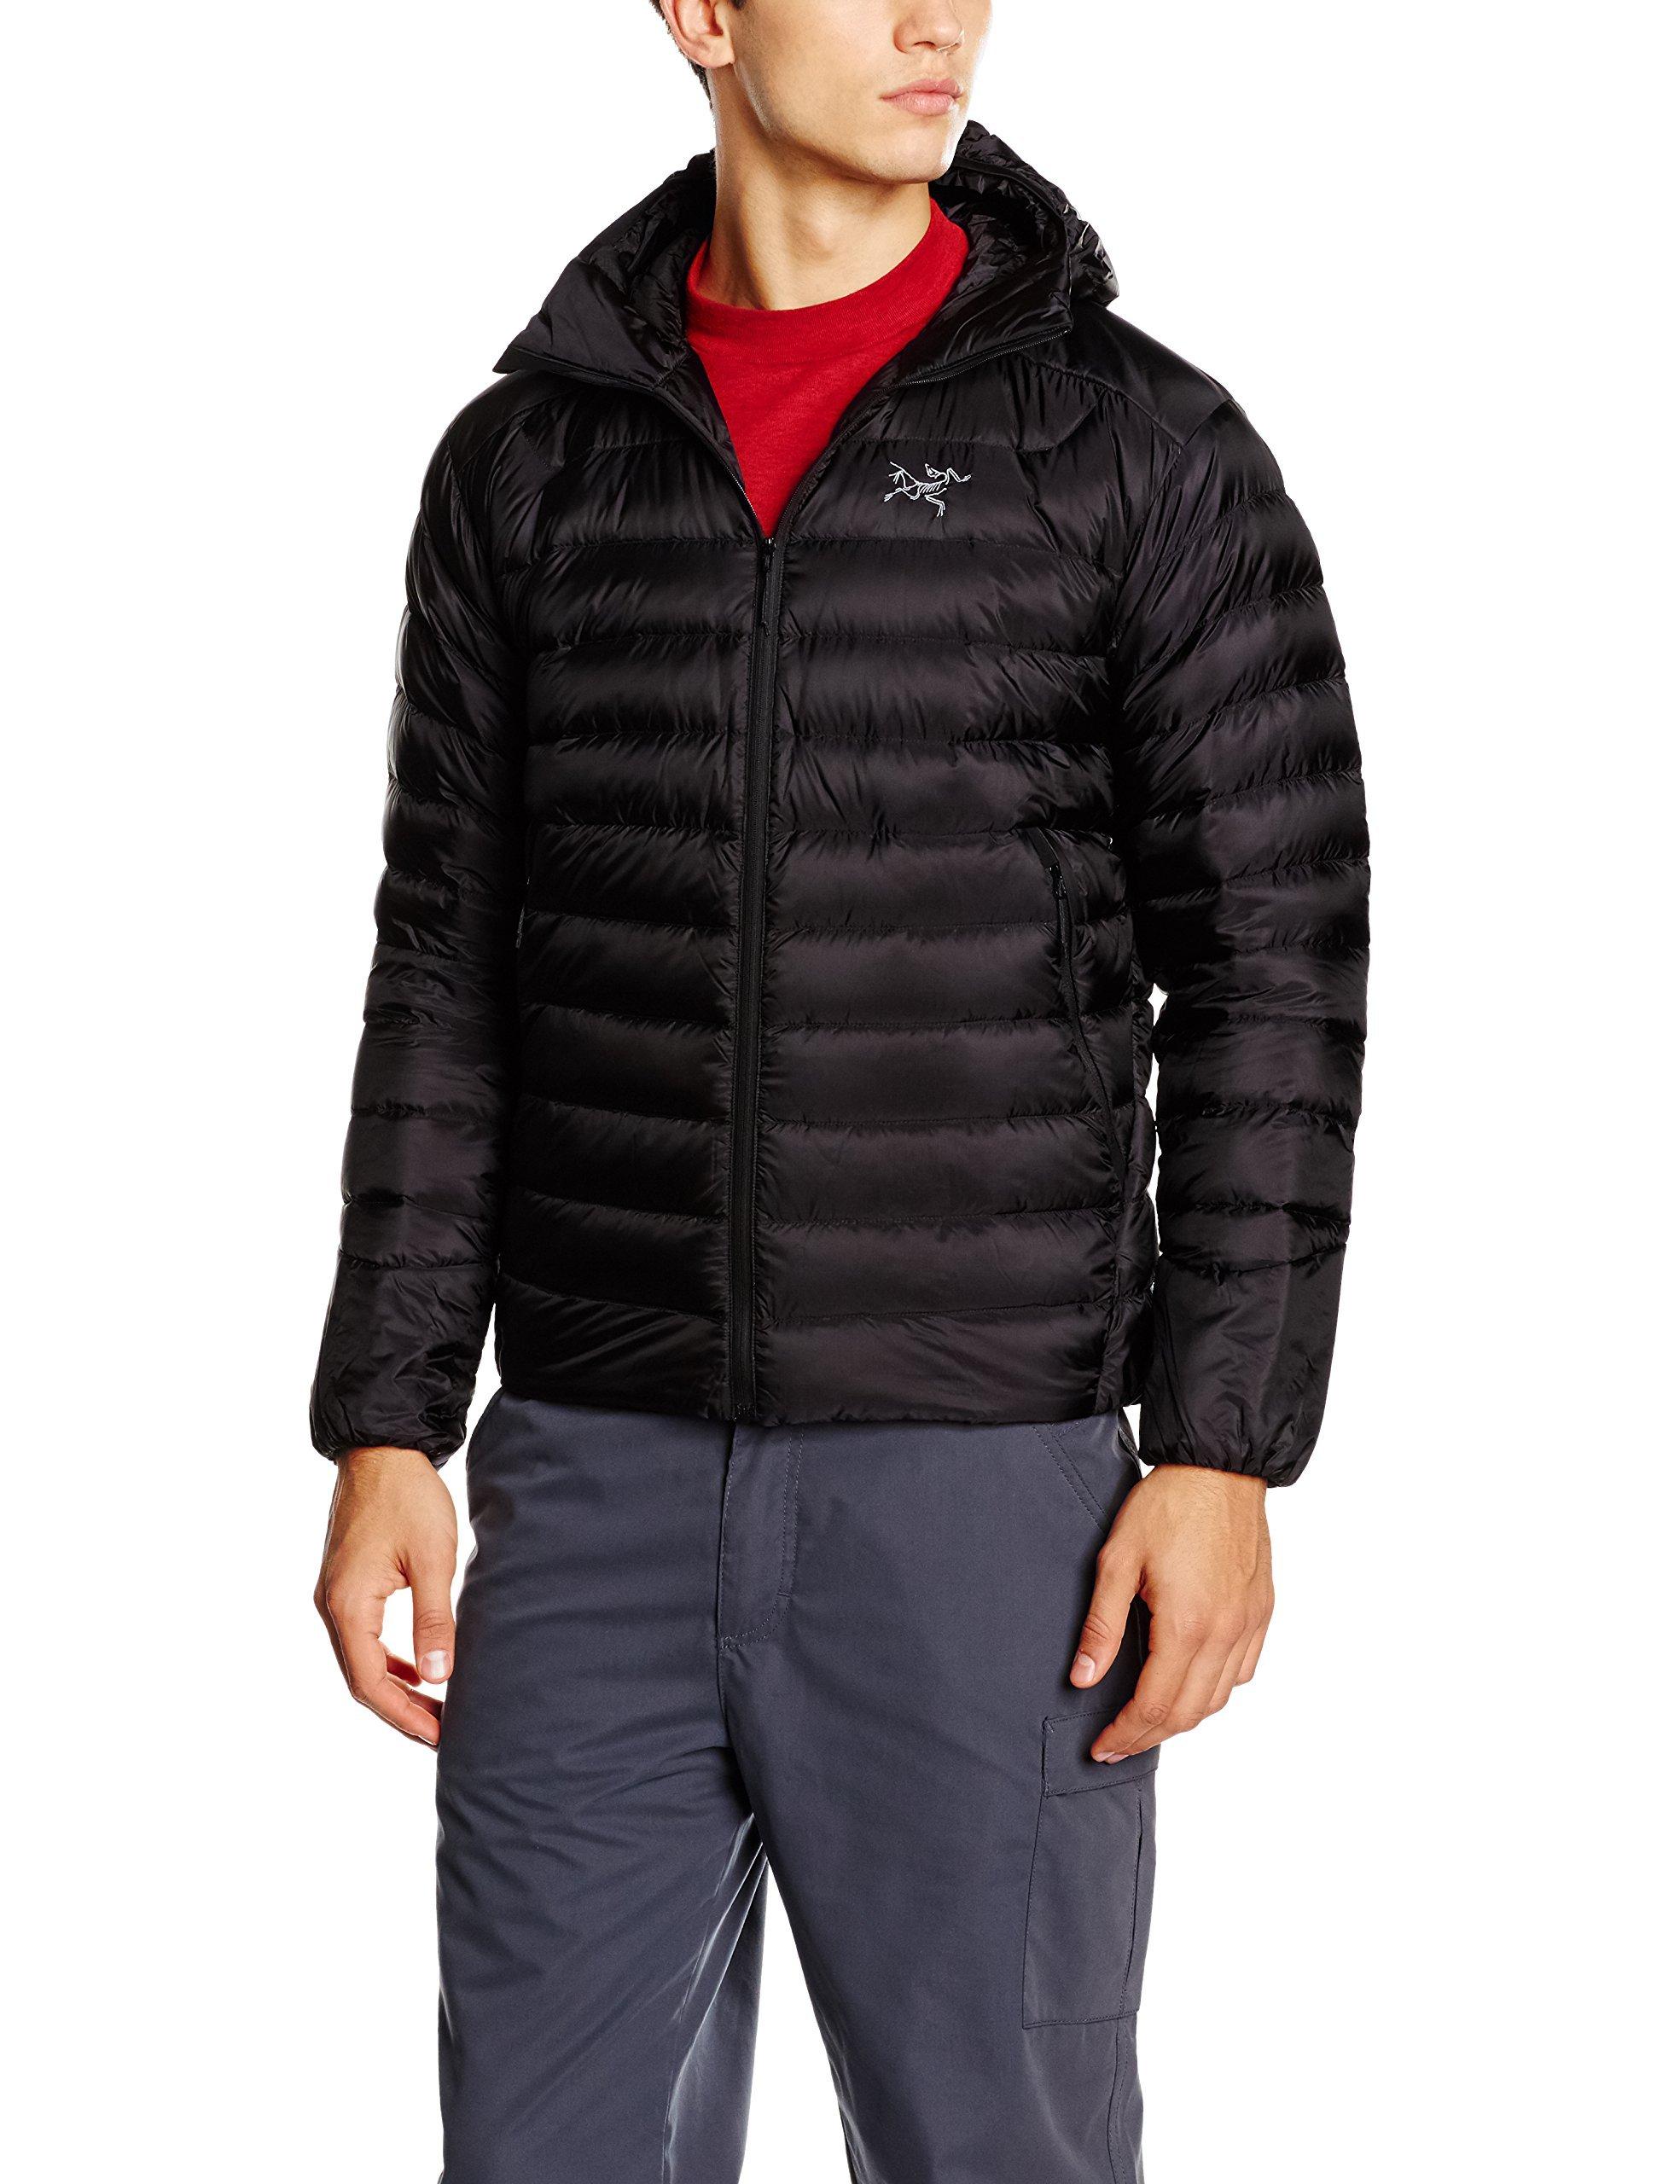 Arc'Teryx Men's Cerium LT Hooded Jacket, Black, Large